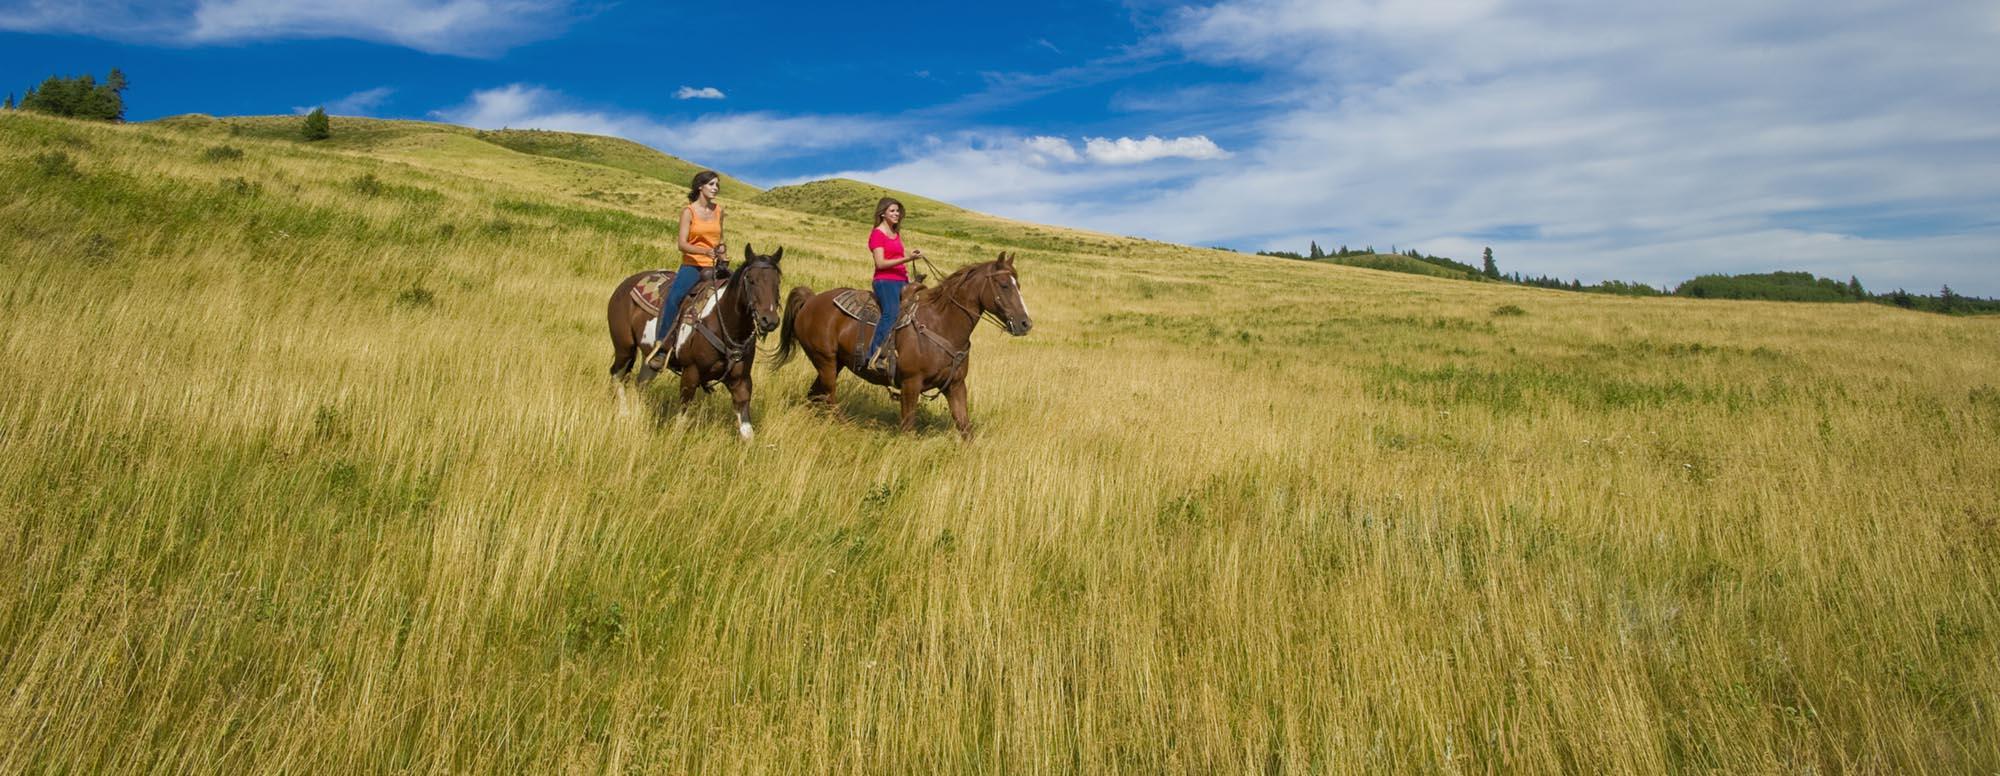 Historic Reesor Ranch, near Cypress Hills Interprovincial Park - West Block Wilderness Area Photo credit: Tourism Saskatchewan/Paul Austring